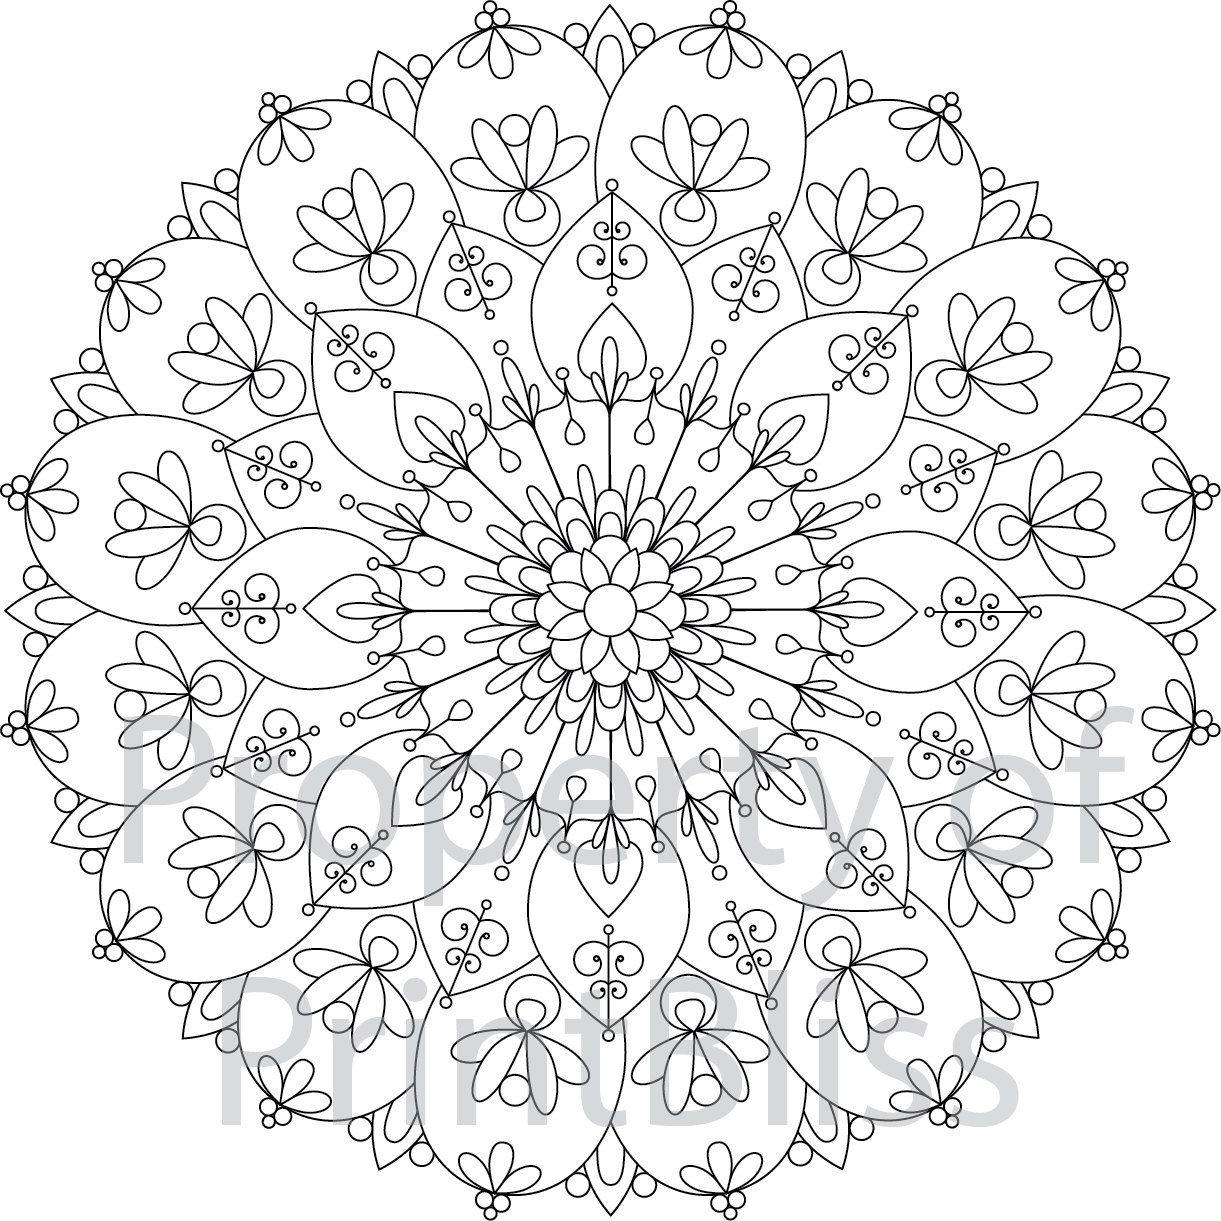 7 Flower Mandala Printable Coloring Page By Printbliss